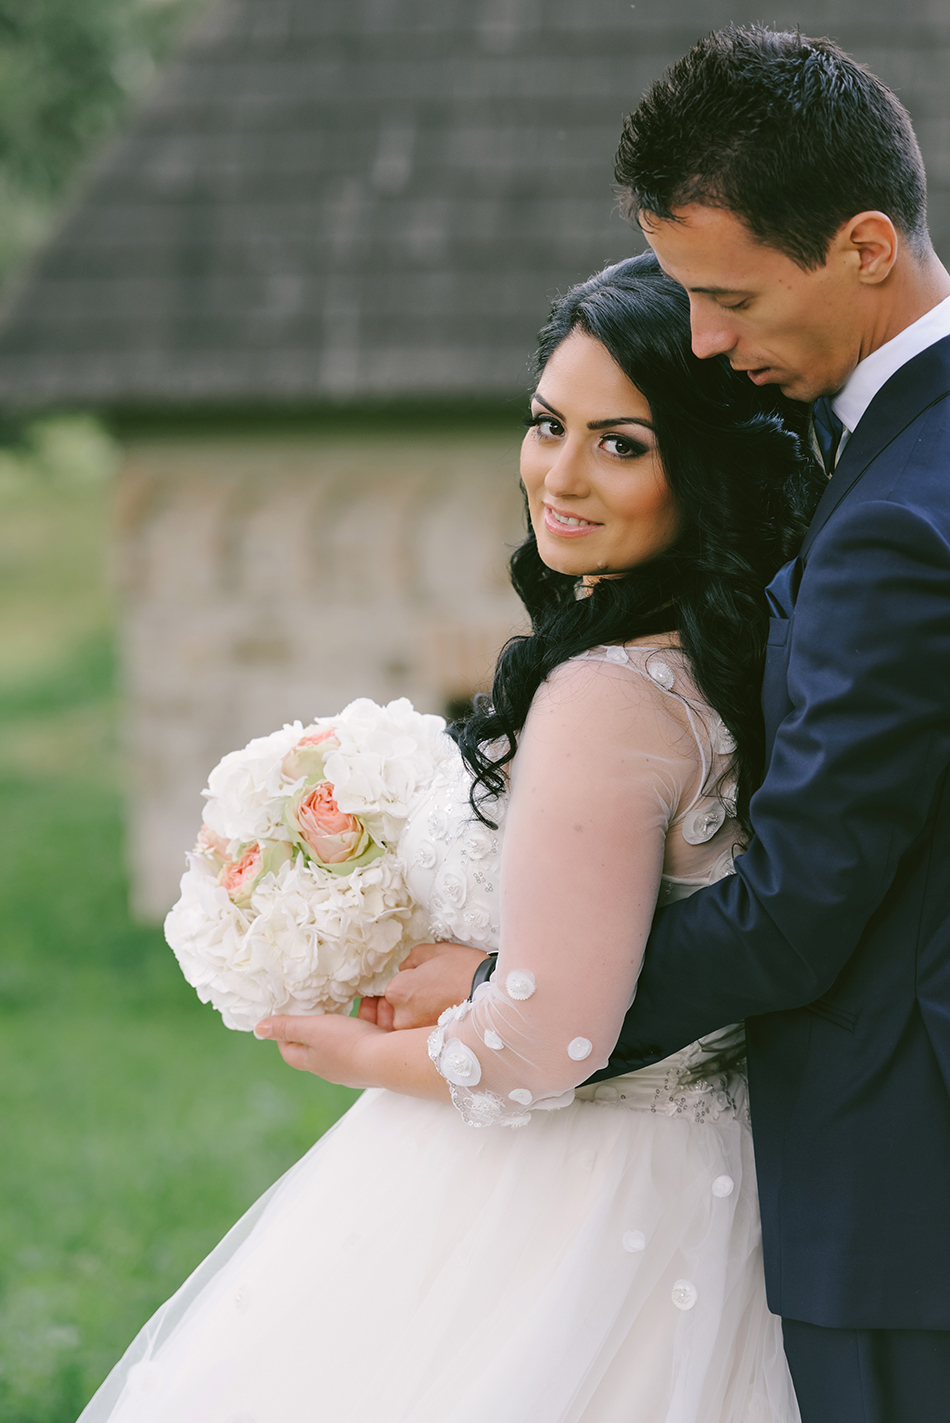 AD Passion Photography | ad-passion_diana-si-gabi_fotograf-nunta-suceava_0052 | Adelin, Dida, fotograf profesionist, fotograf de nunta, fotografie de nunta, fotograf Timisoara, fotograf Craiova, fotograf Bucuresti, fotograf Arad, nunta Timisoara, nunta Arad, nunta Bucuresti, nunta Craiova